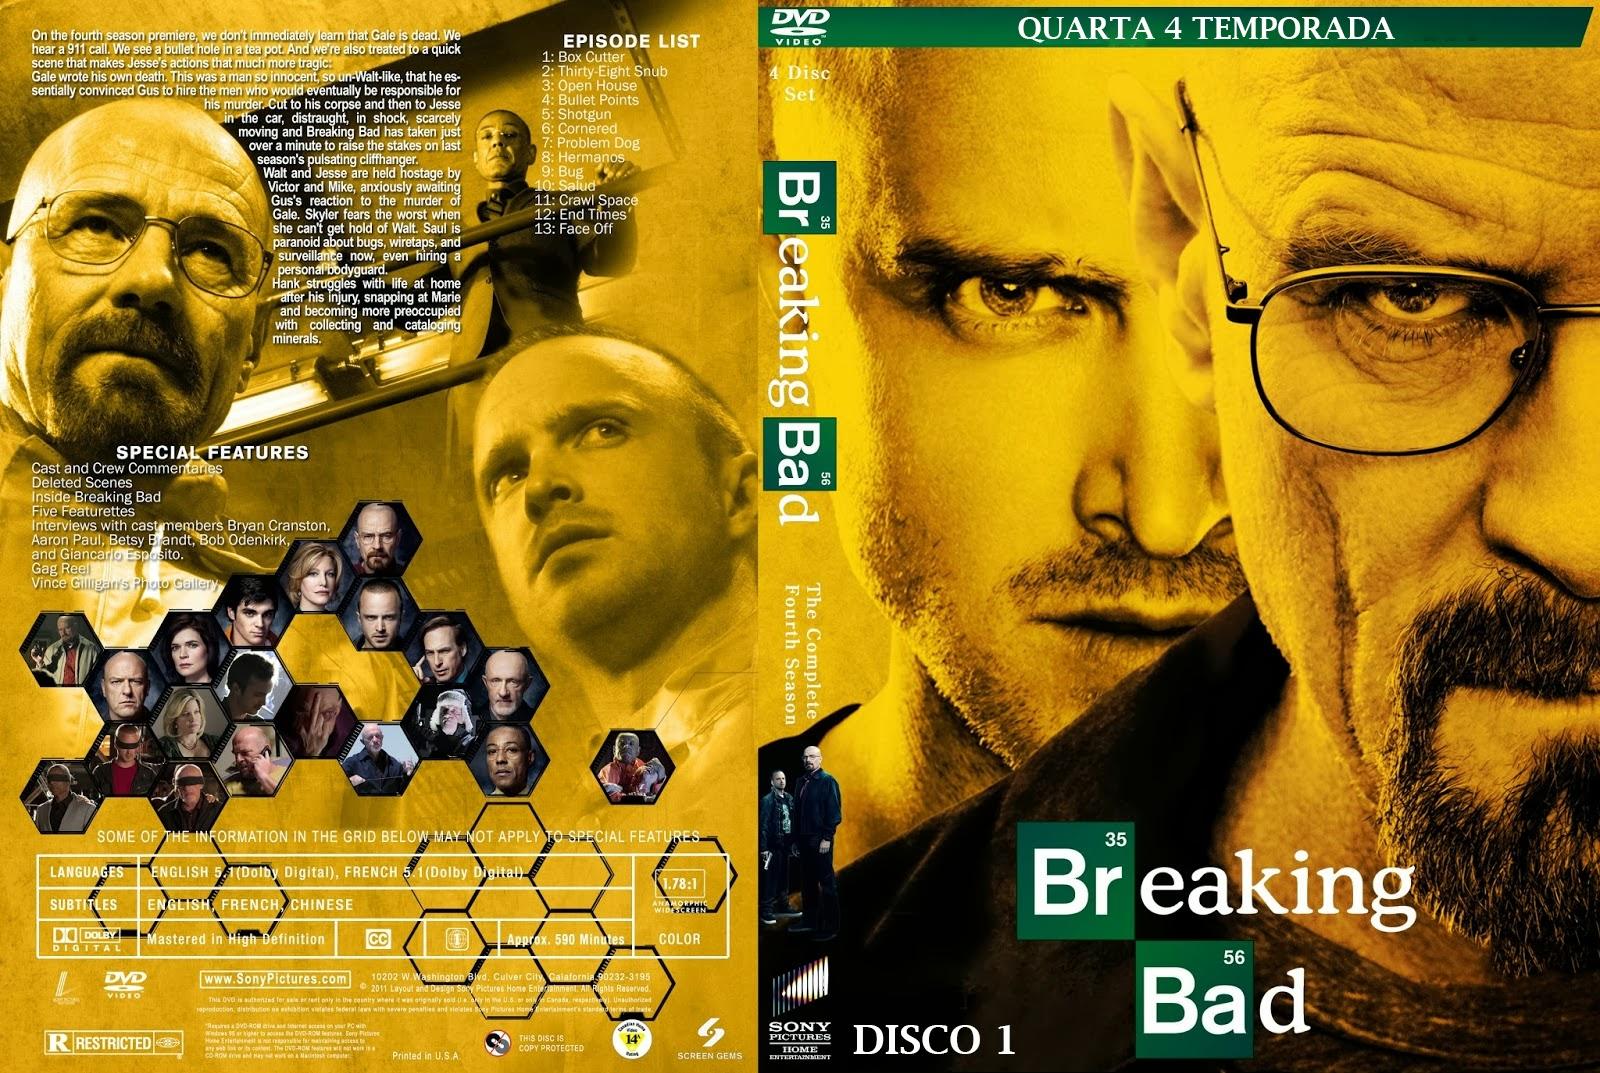 BREAKING BAD 4ª TEMPORADA DISCO: 1, 2 E 3 ~ ZICA TOP CAPAS